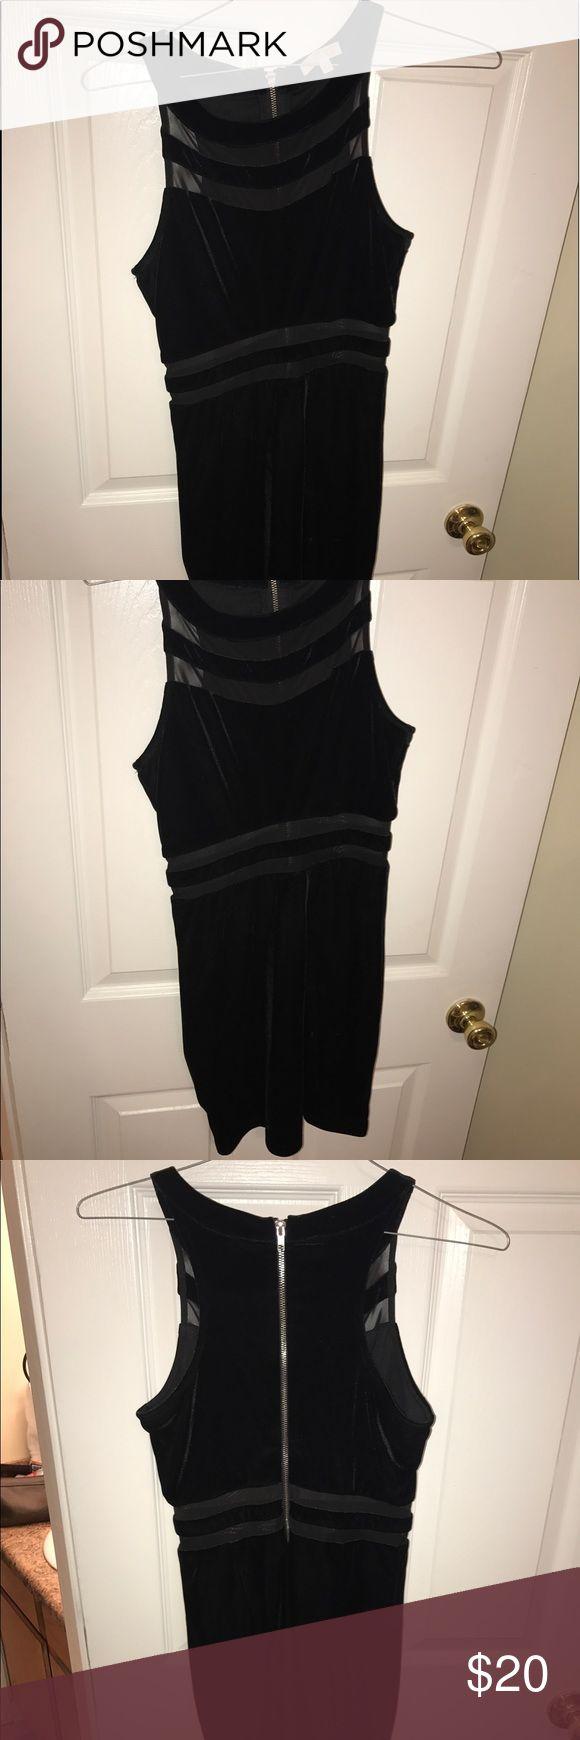 Body con dress Black Velvet/Shear Gianni Bini Bodycon Dress Gianni Bini Dresses